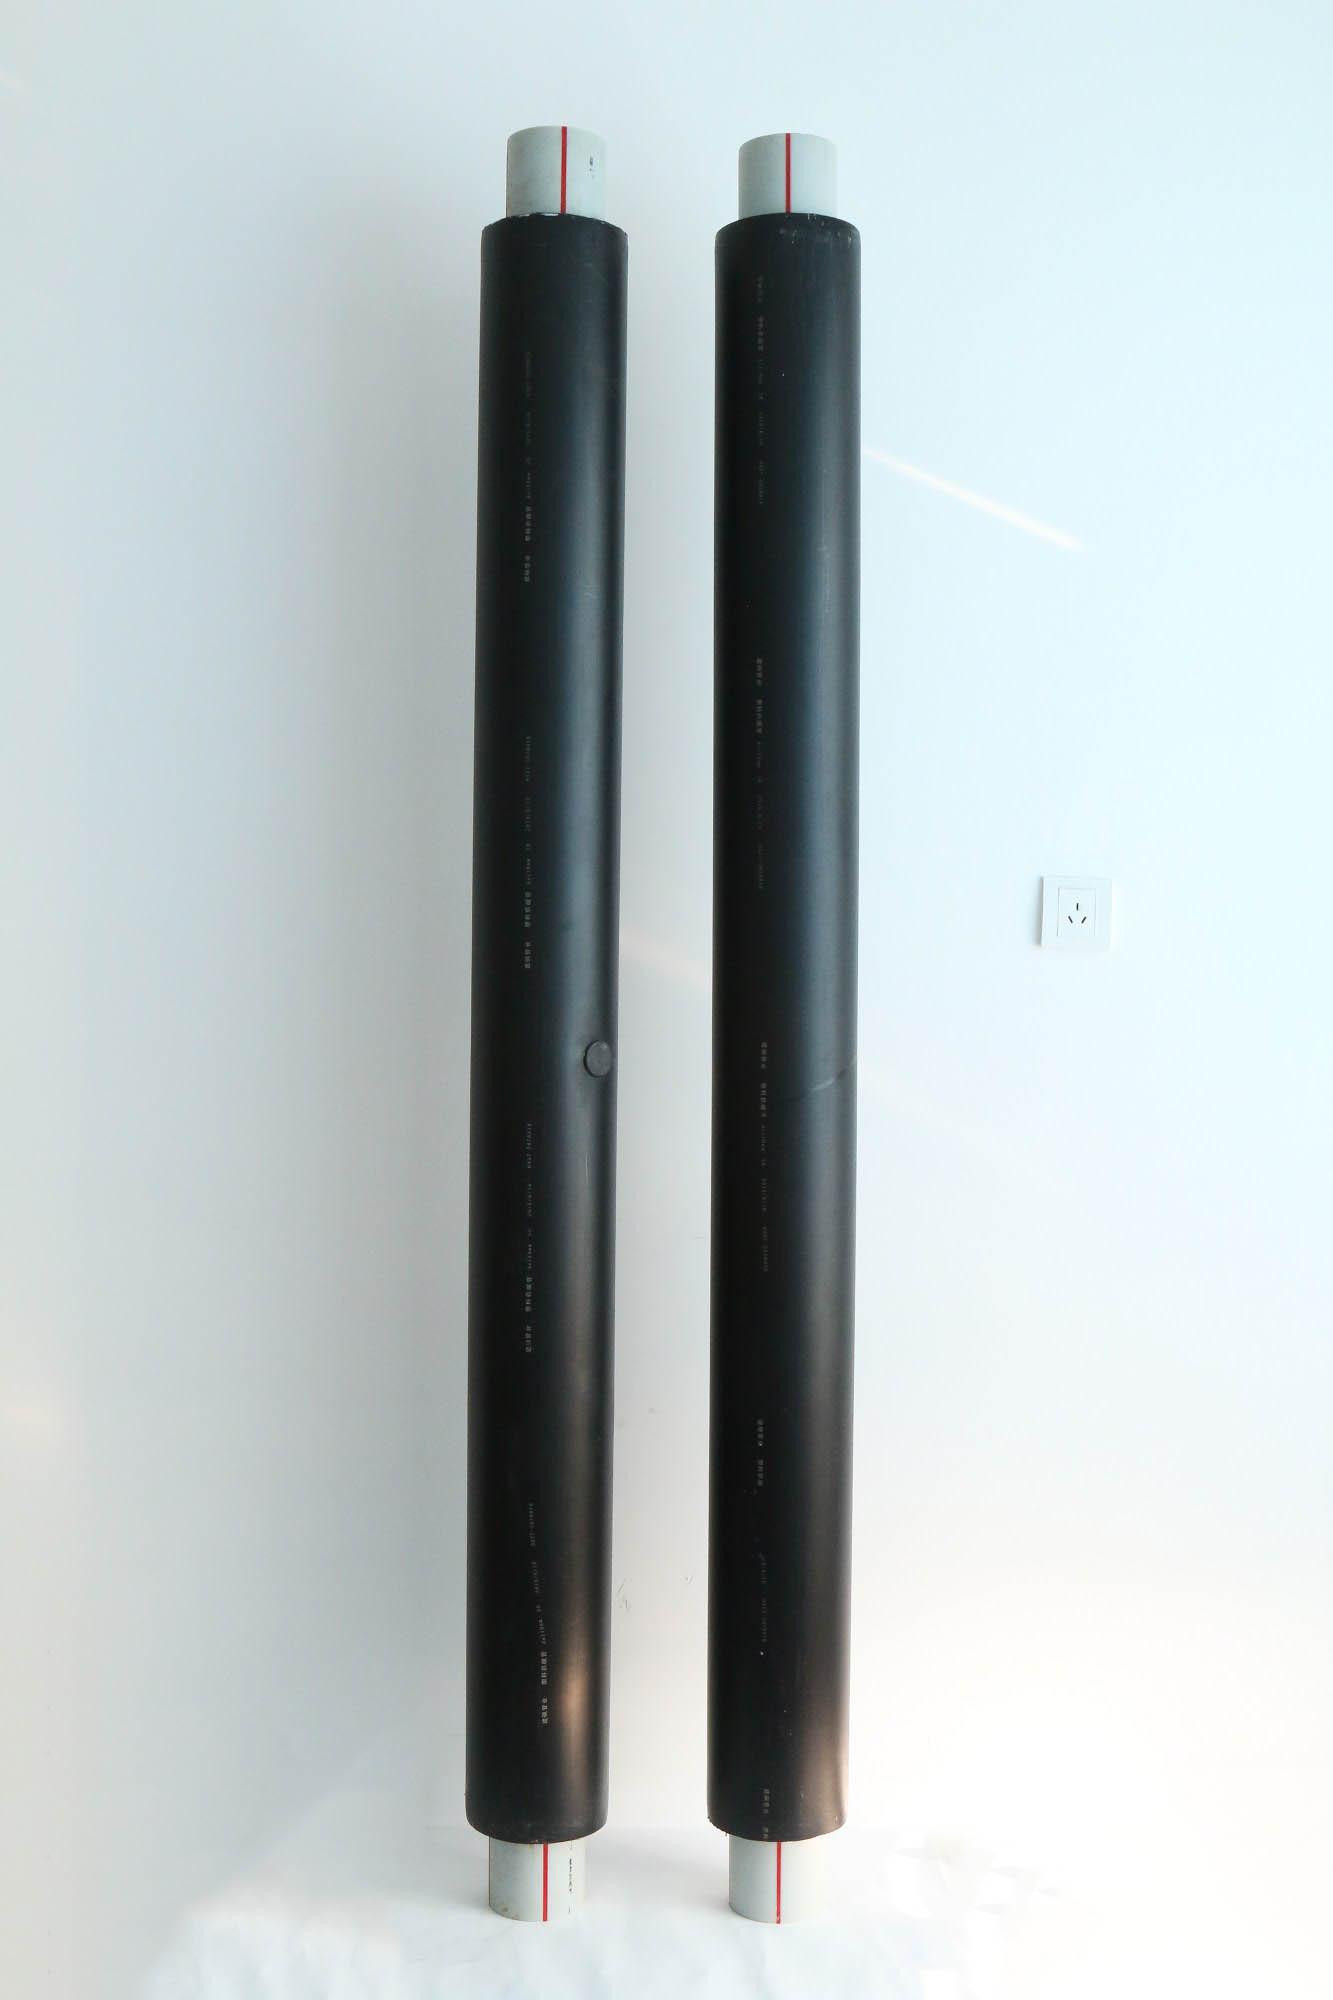 PERTⅡ型二次管网用热水管SDR11 De110x10mm5_副本.jpg